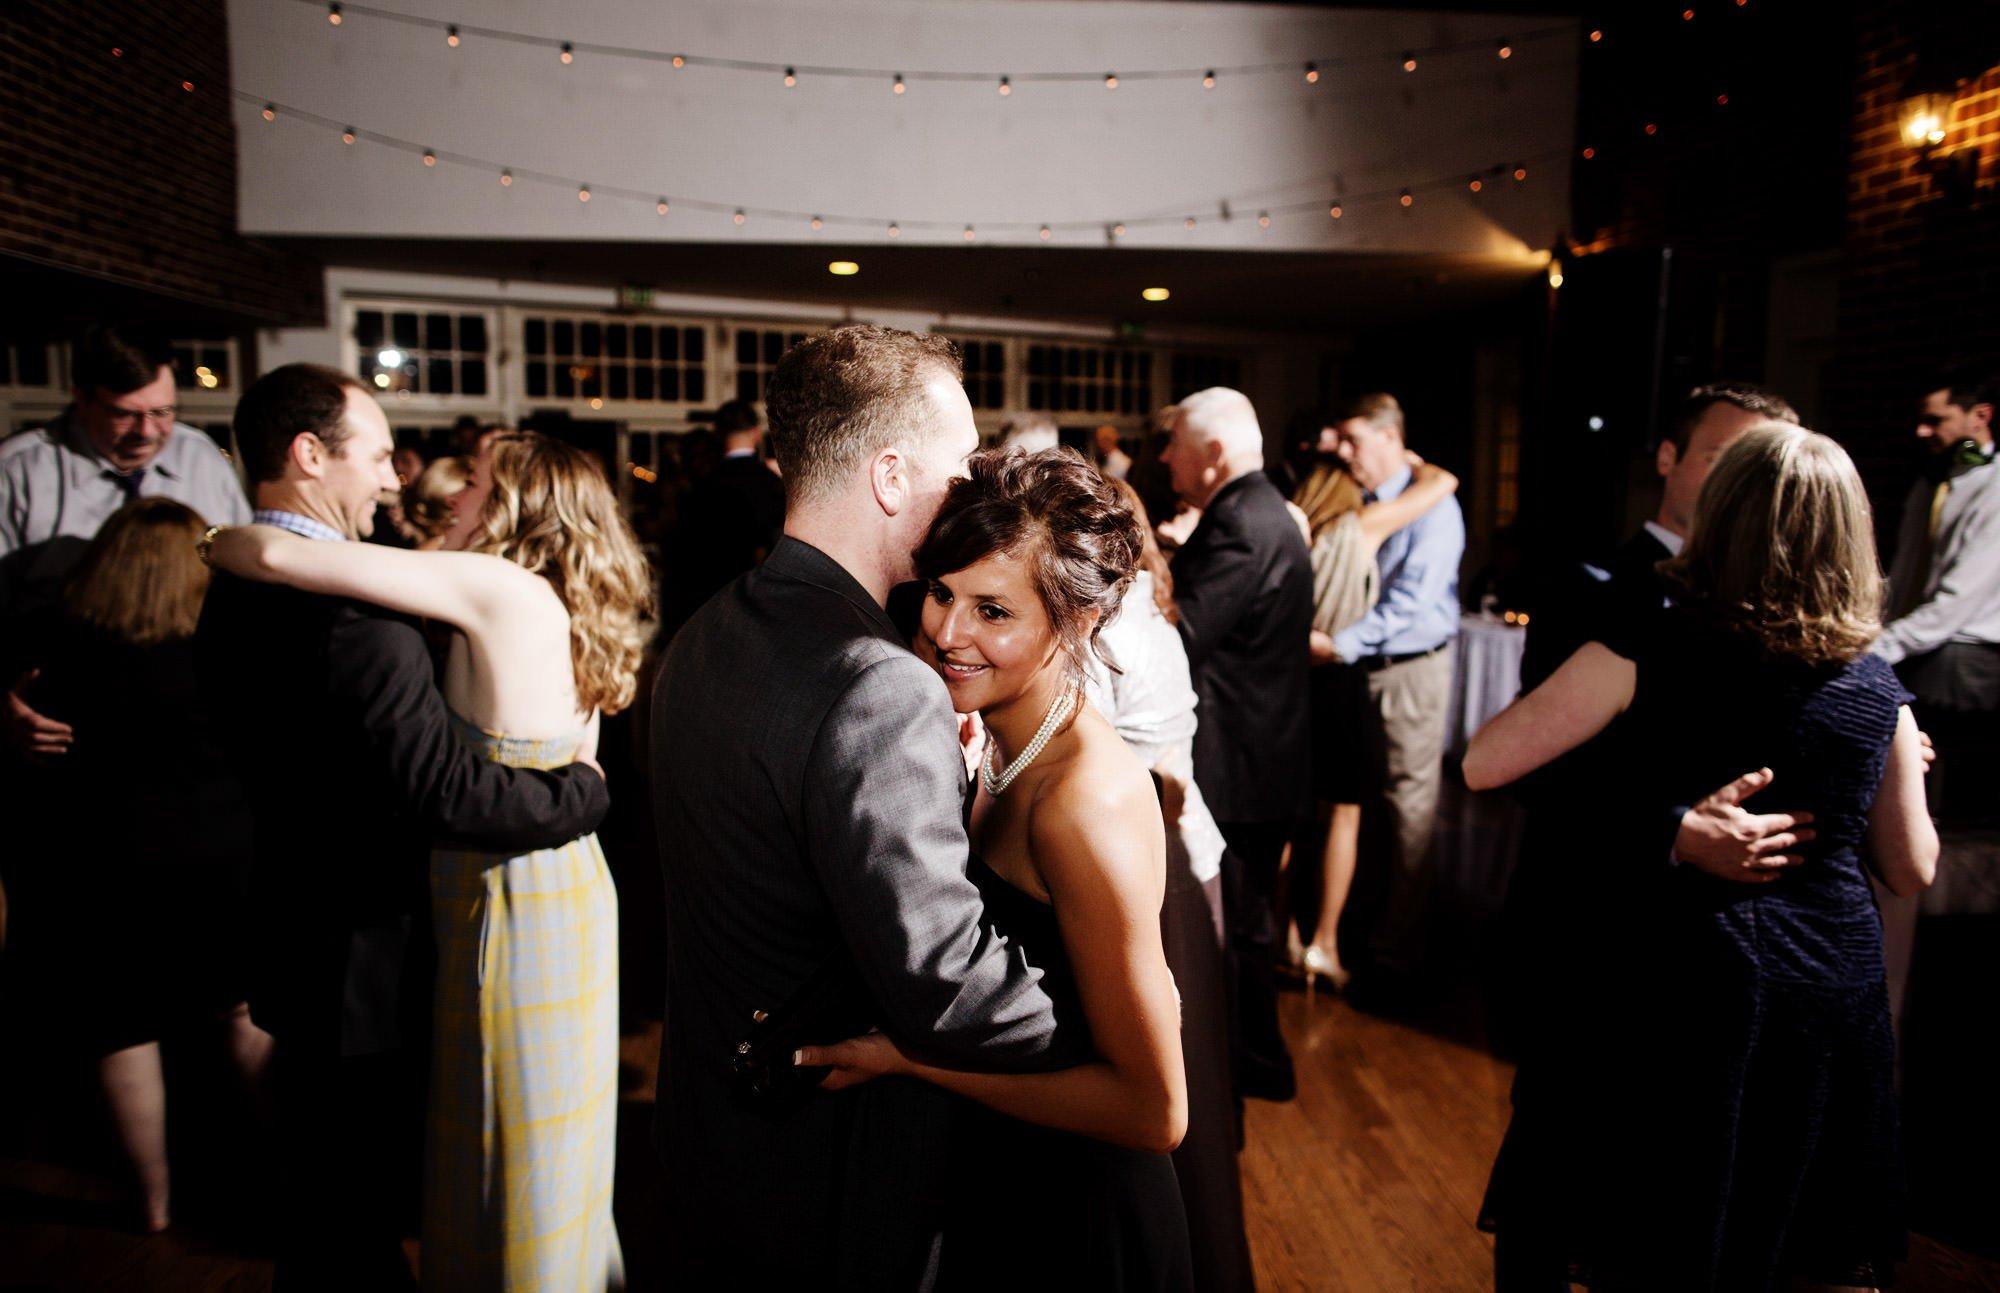 Guests enjoy the wedding reception at Governor Calvert House.